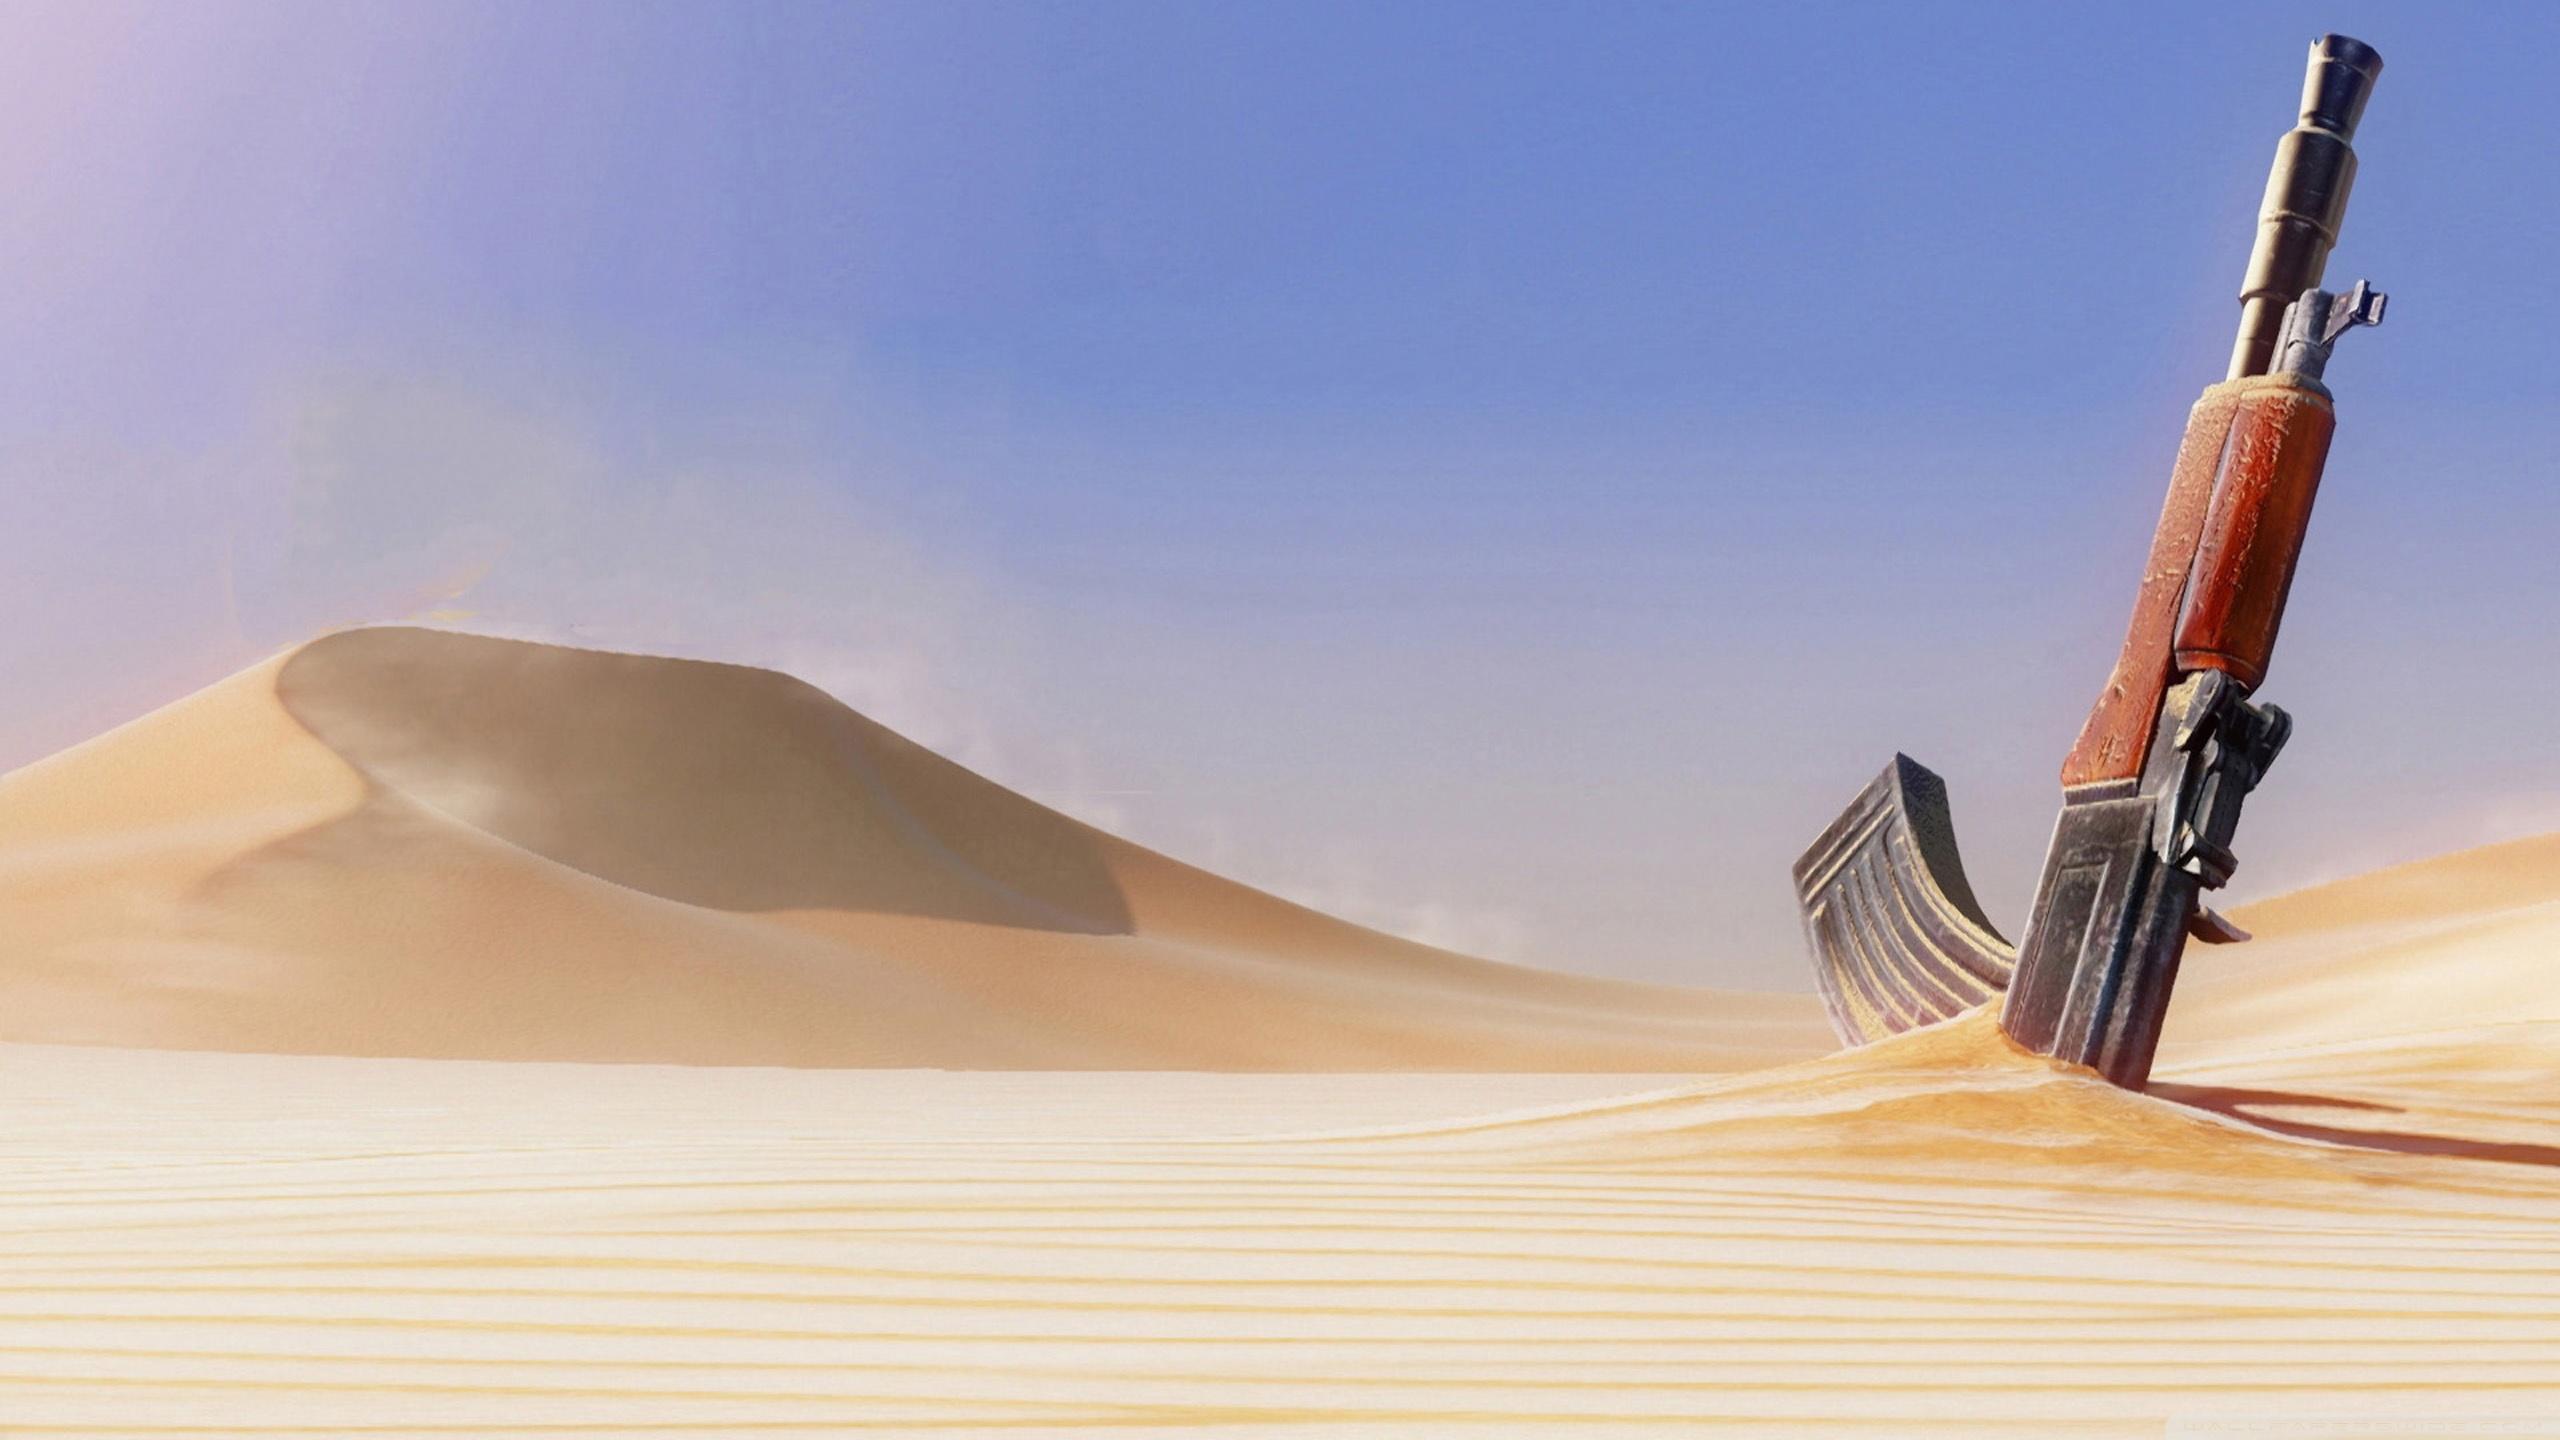 Ak 47 In Sand Hd Wallpaper Wallpaperlistscom